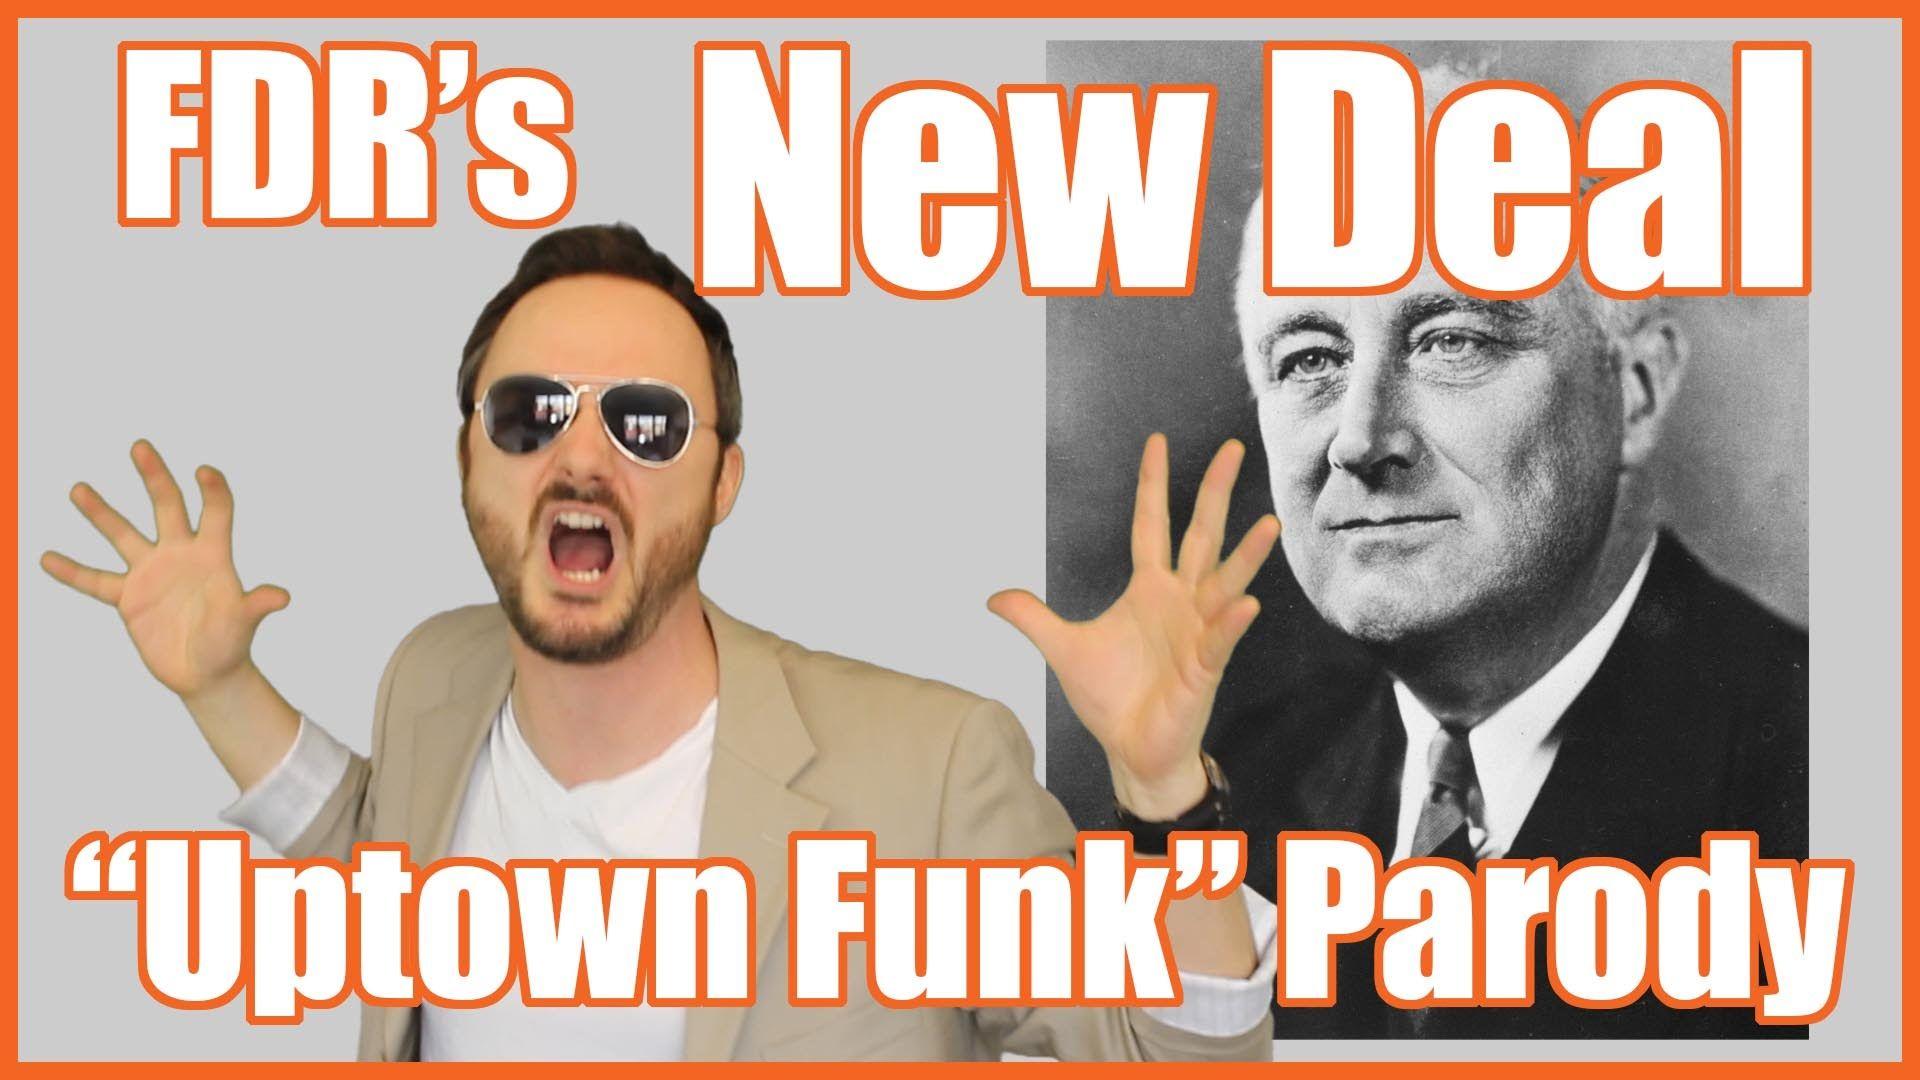 New Deal Uptown Funk Parody Mrbettsclass Teaching History Teaching American History Social Studies Middle School